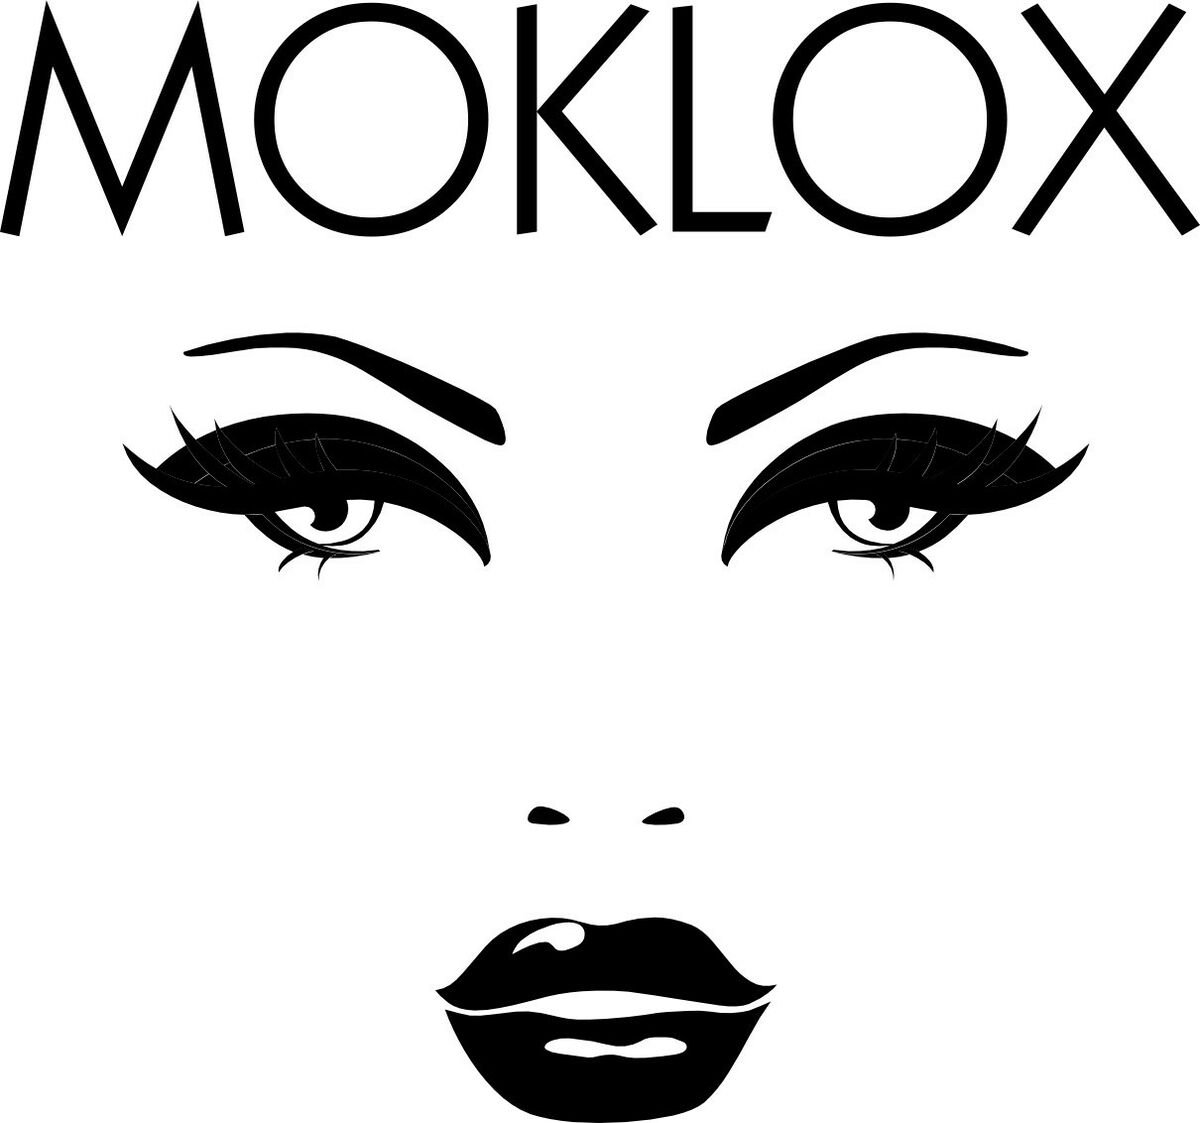 Moklox